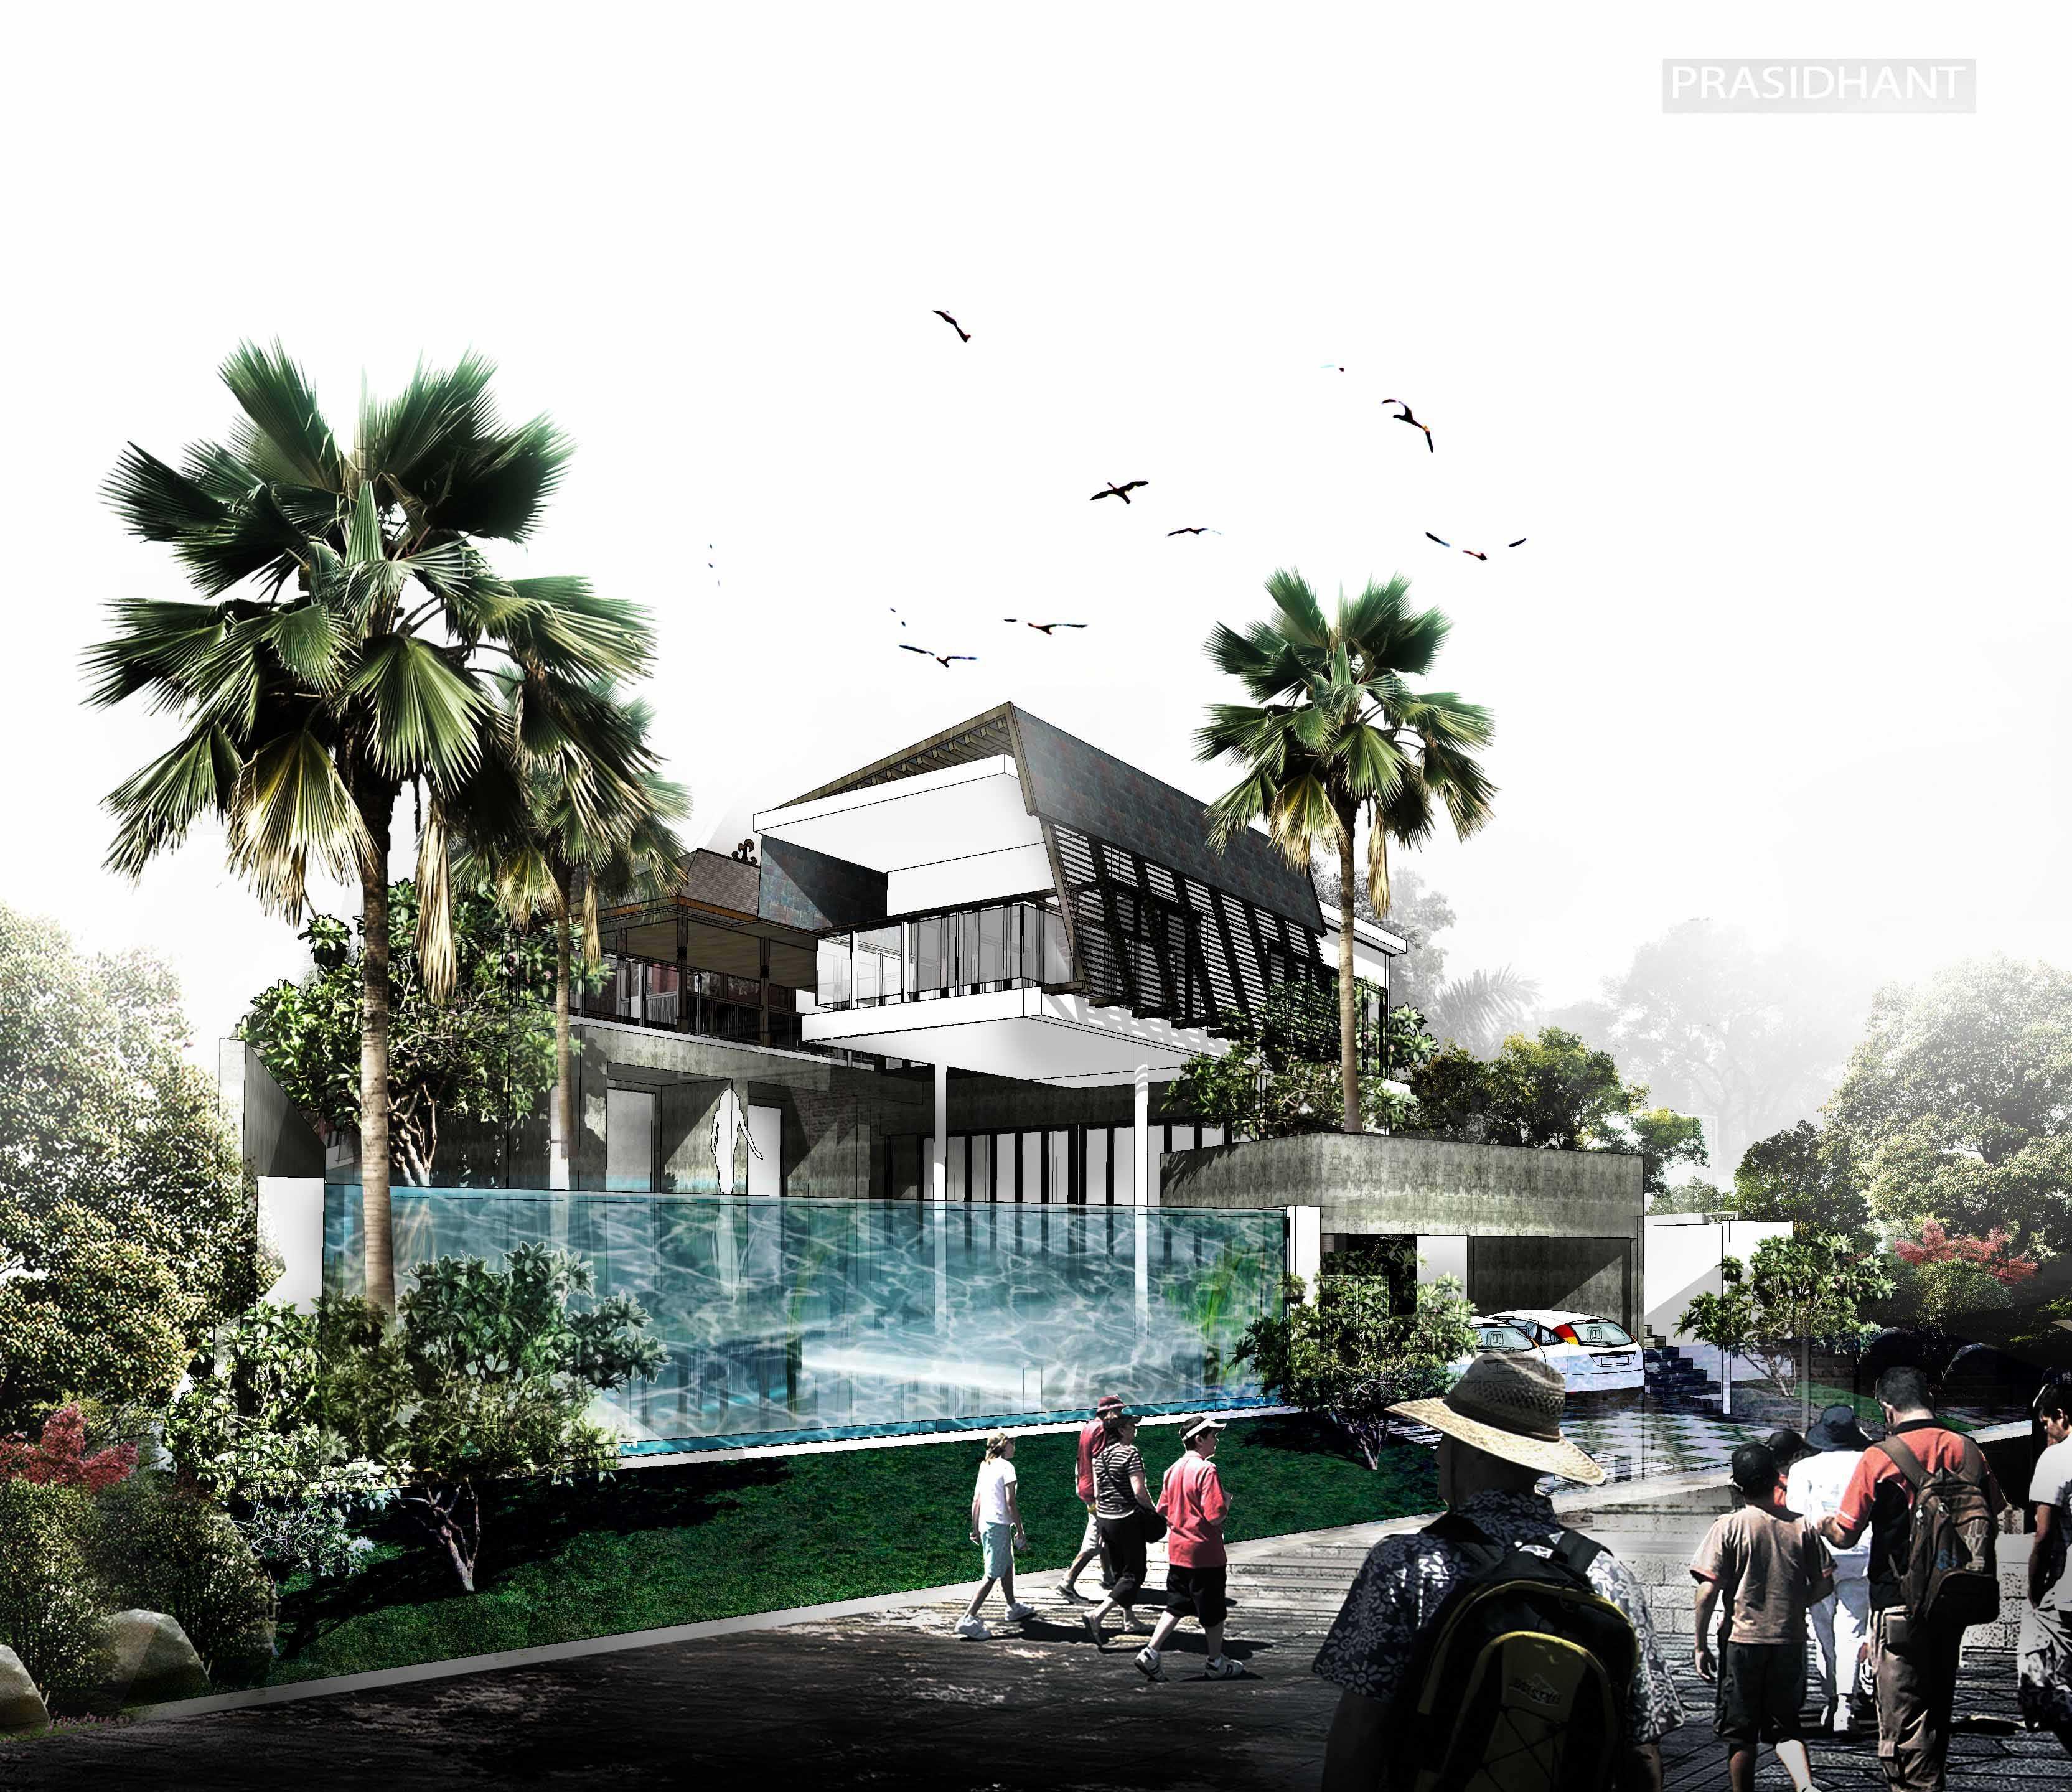 Pds (Prasidhanta Design Studio) Reflect House, Seminyak Bali Seminyak, Kuta, Badung Regency, Bali, Indonesia Seminyak, Kuta, Badung Regency, Bali, Indonesia Studi-3D-Insta   30356